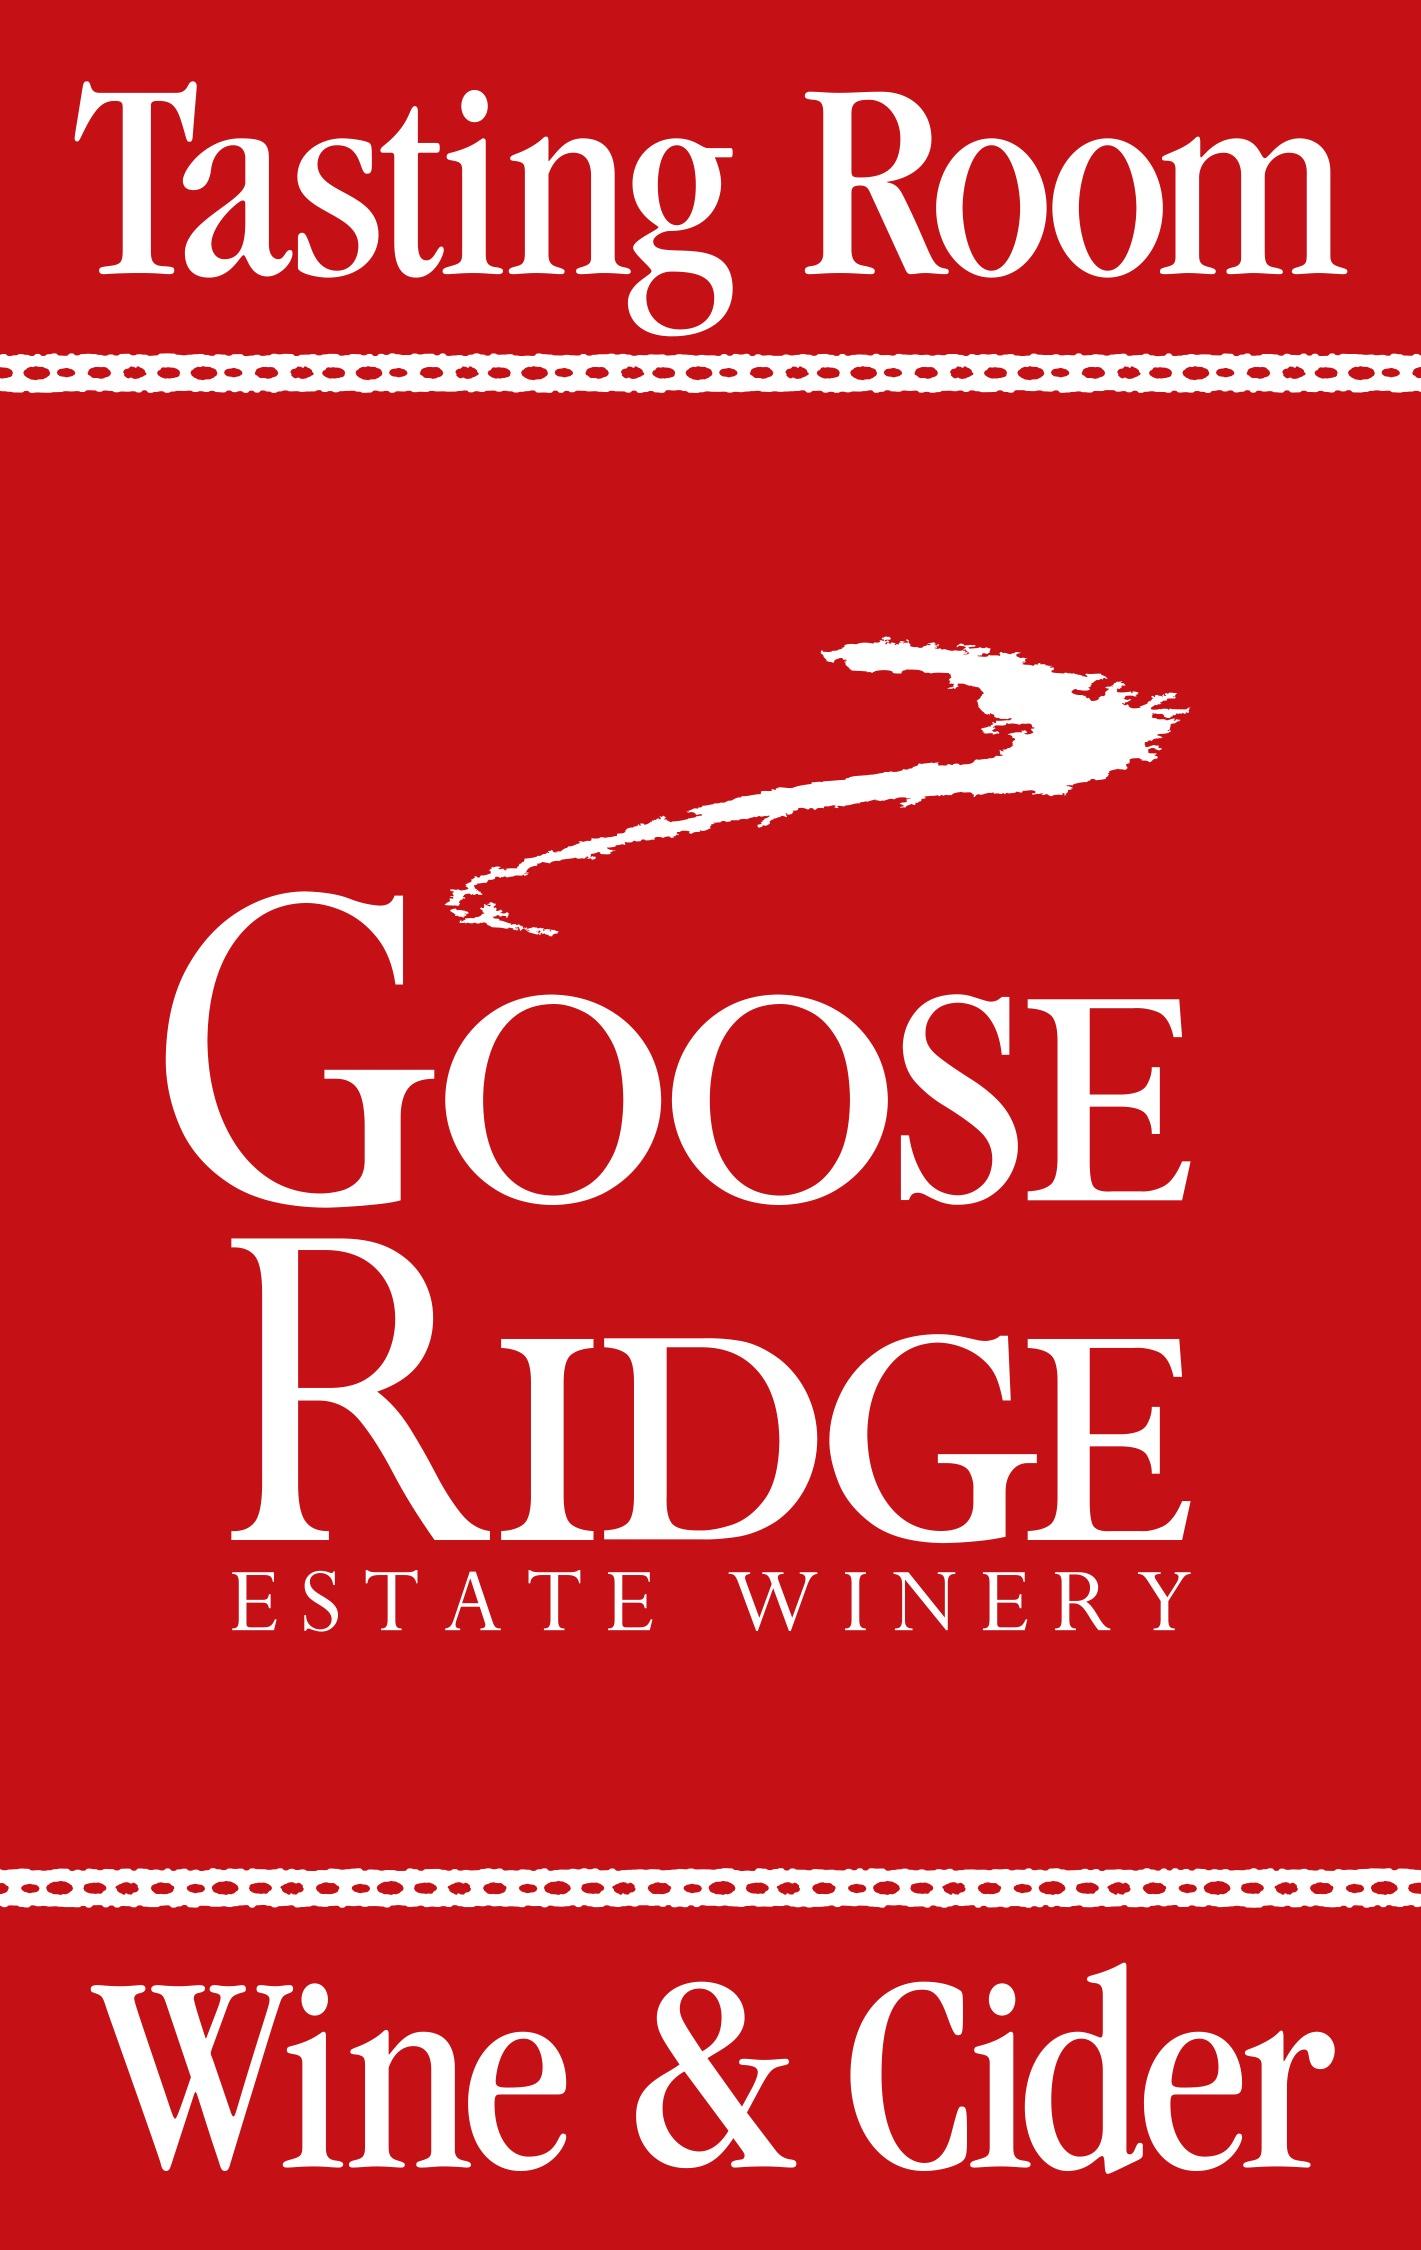 Goose Ridge Sign Options-5.jpg